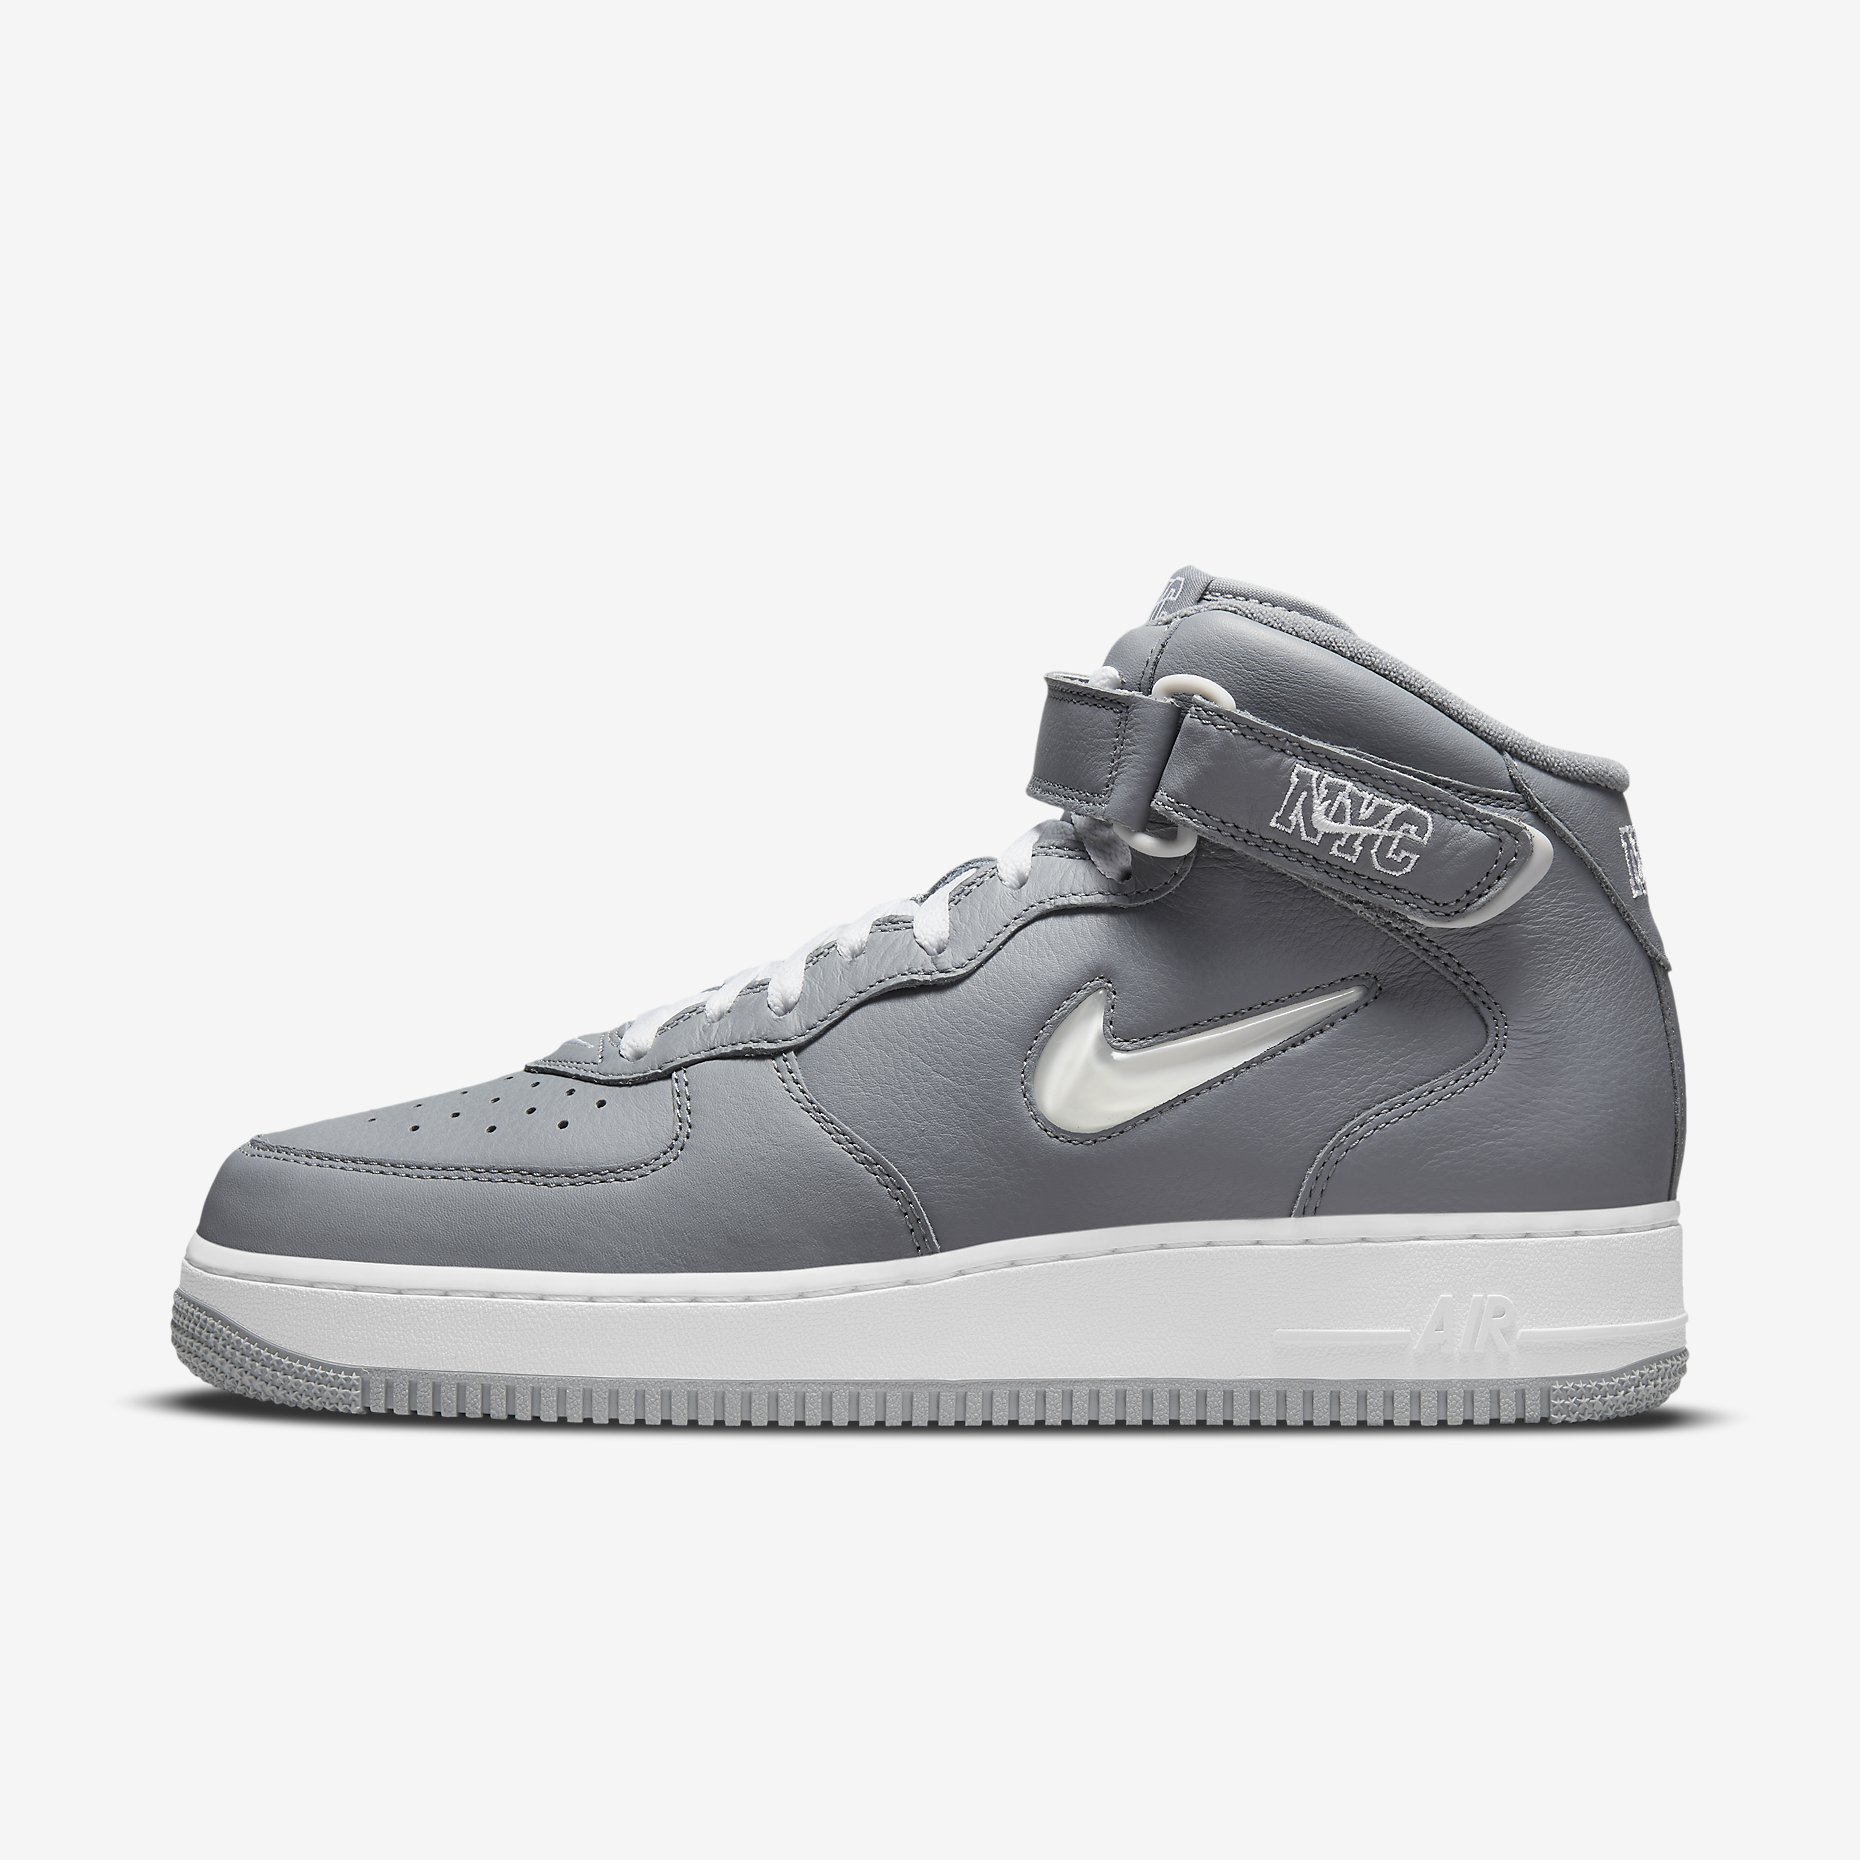 Nike Air Force 1 Mid Jewel NYC 'Cool Grey'